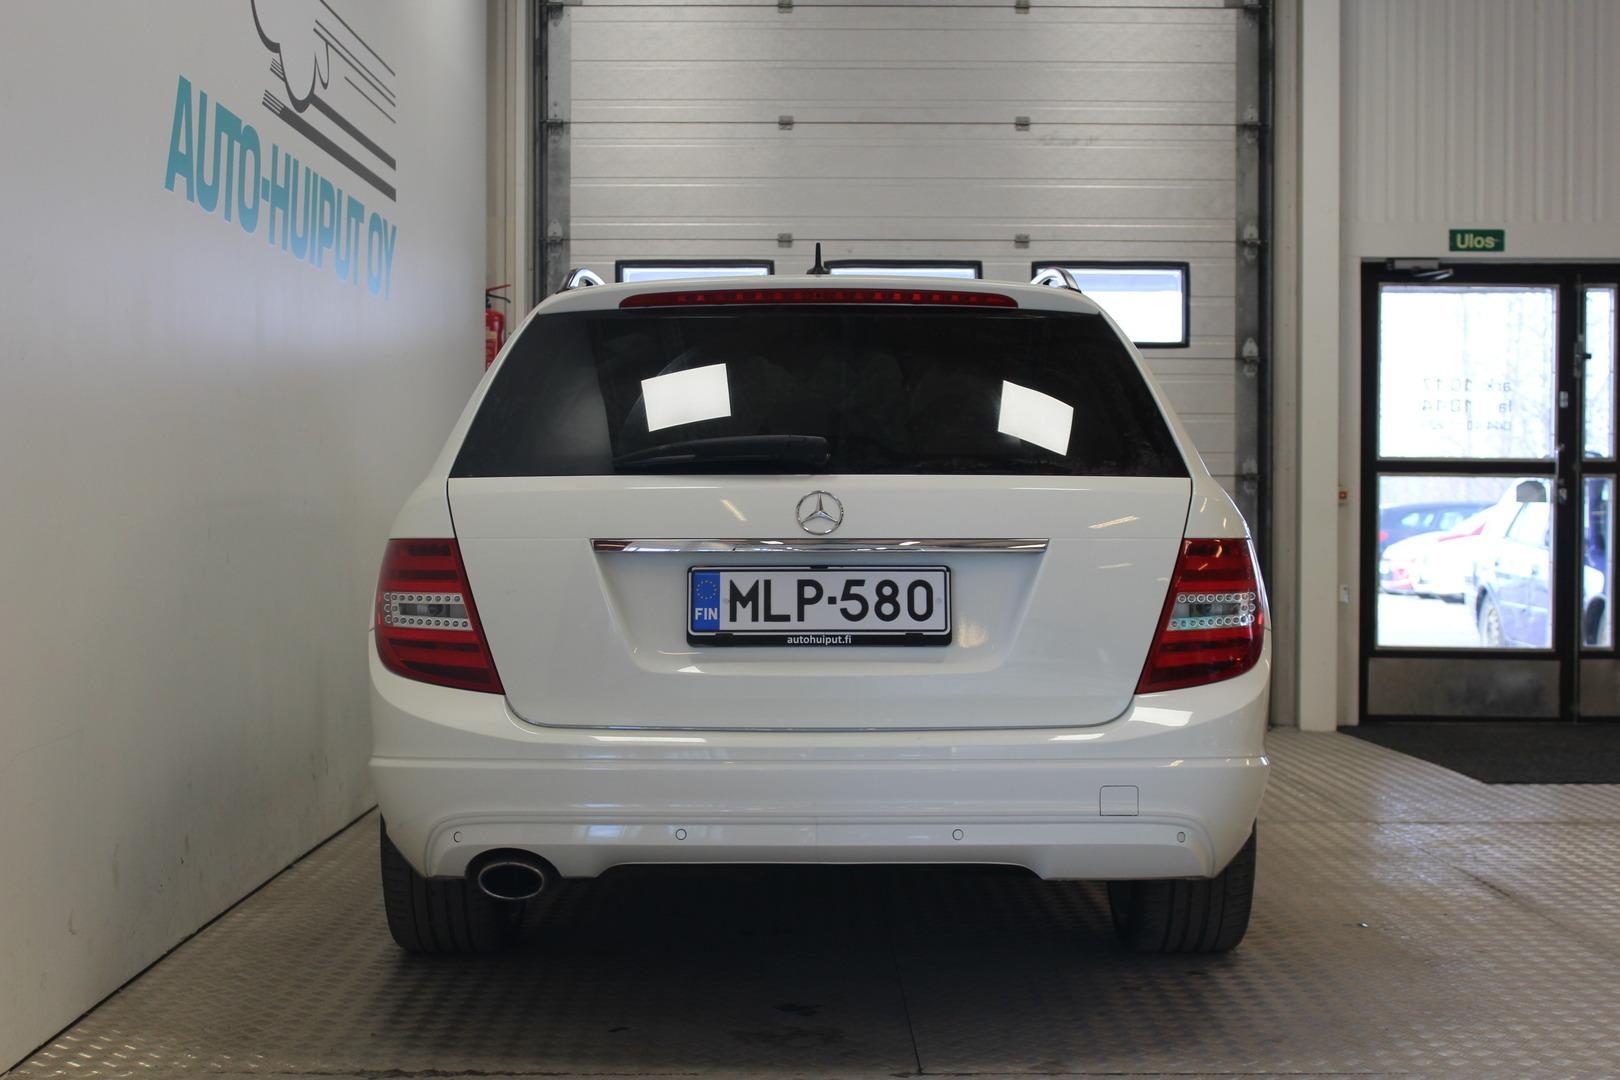 Mercedes-Benz C, 250 CDI 4MATIC 204hv Facelift #Huippusiisti #Neliveto #Webasto Harman/kardon